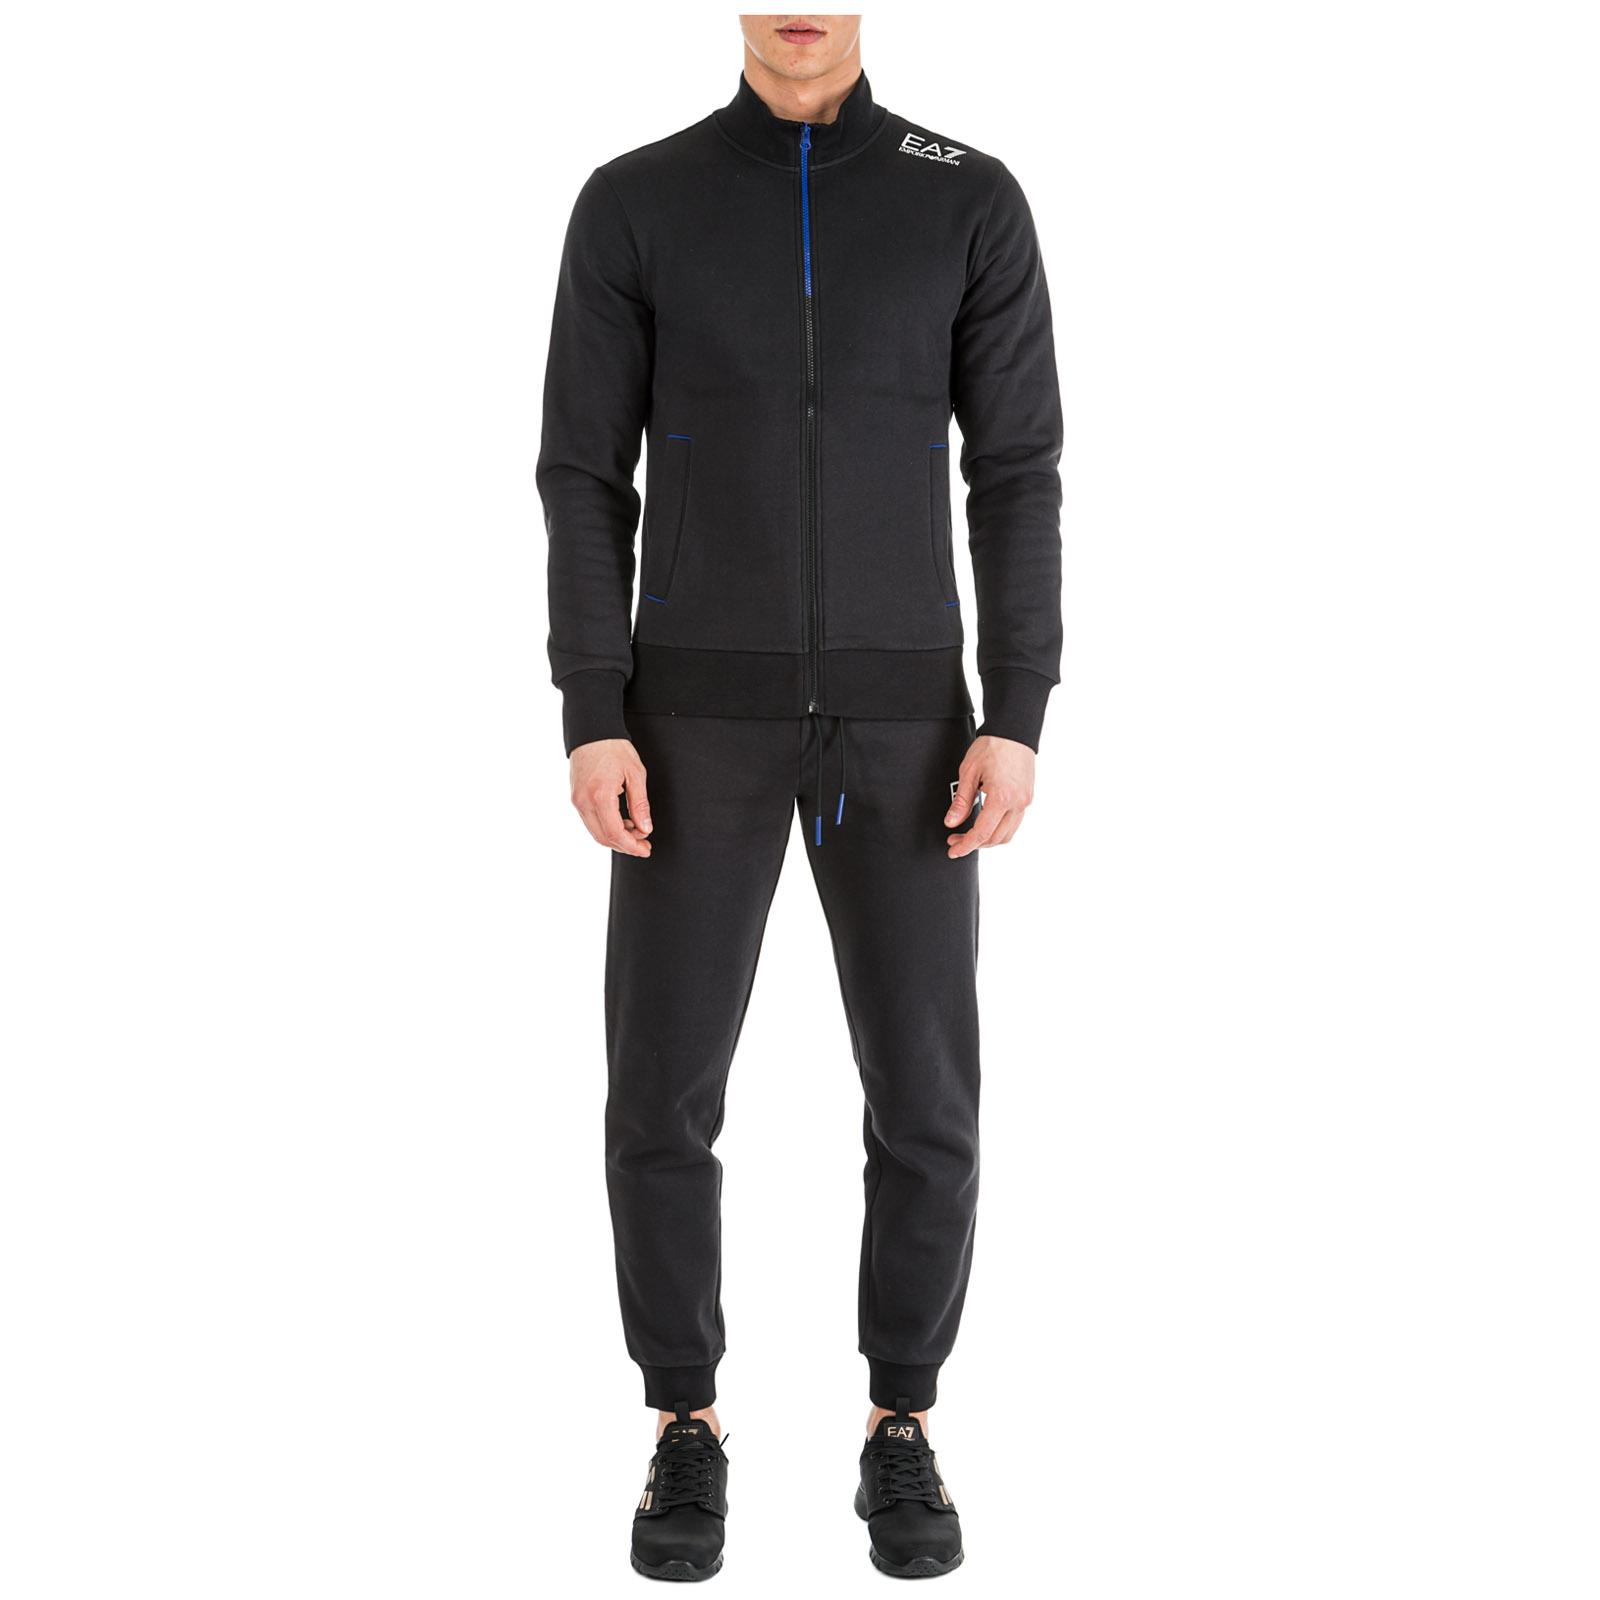 info for 4bc36 97685 Tuta uomo fashion completo felpa pantaloni